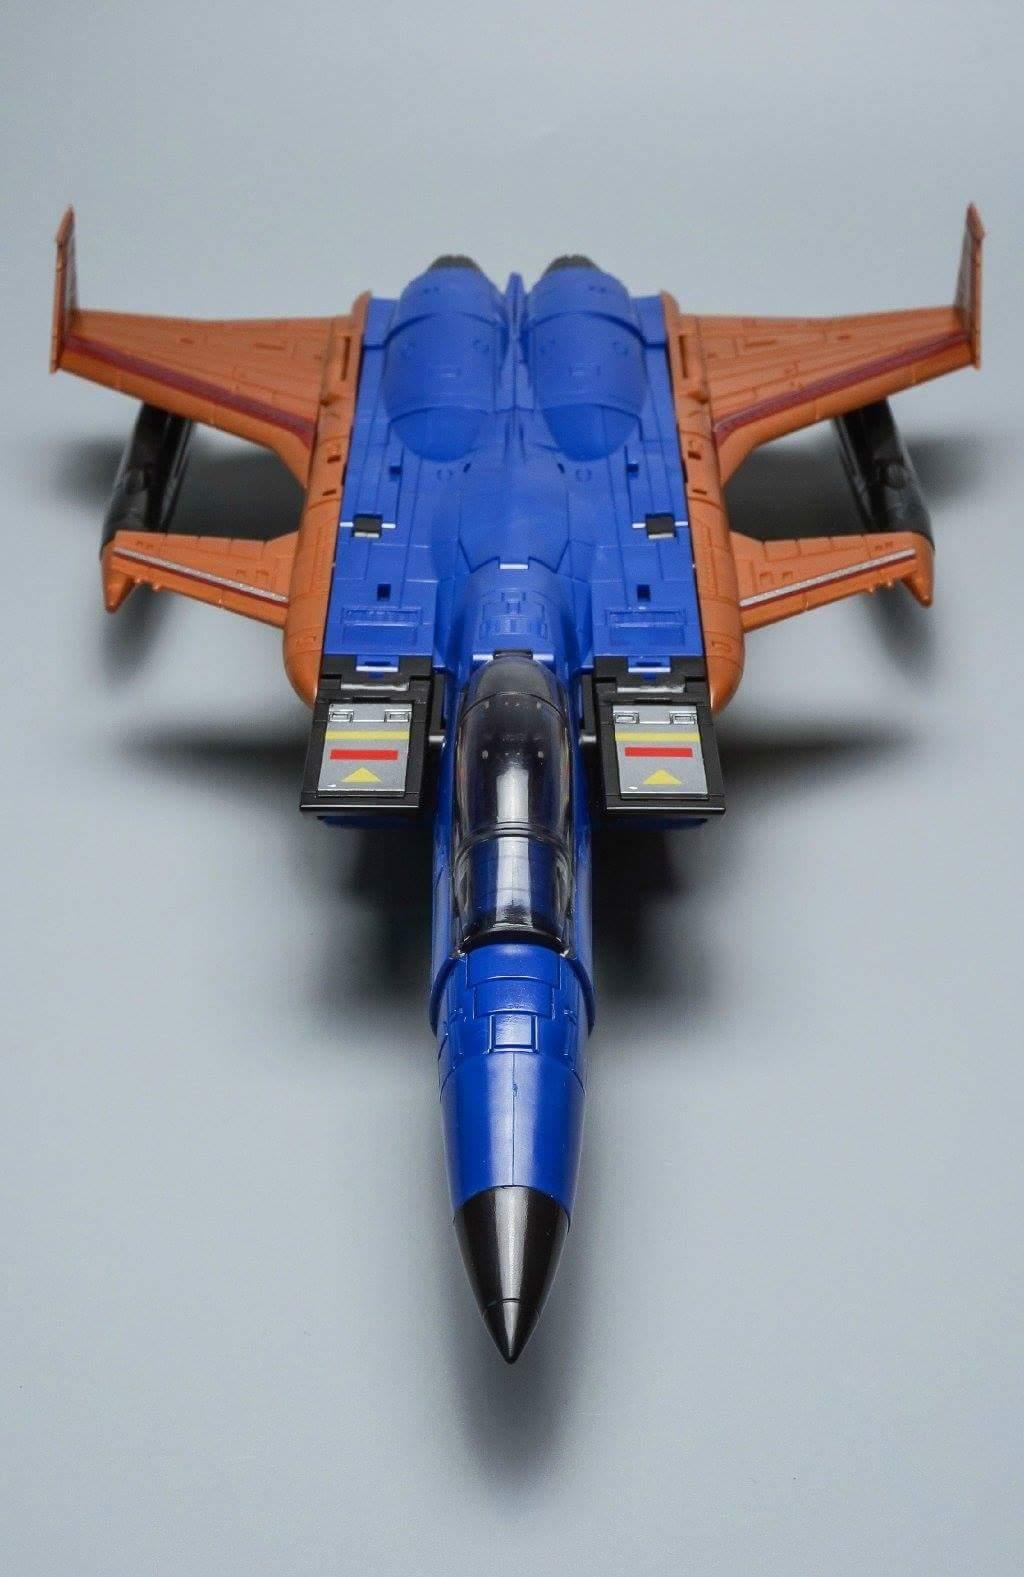 [ToyWorld] Produit Tiers - TW-M02A Combustor (Ramjet/Statoréacto), TW-M02B Assault (Thrust/Fatalo), TW-M02C Requiem (Dirge/Funébro) - Page 2 ACLDRfIP